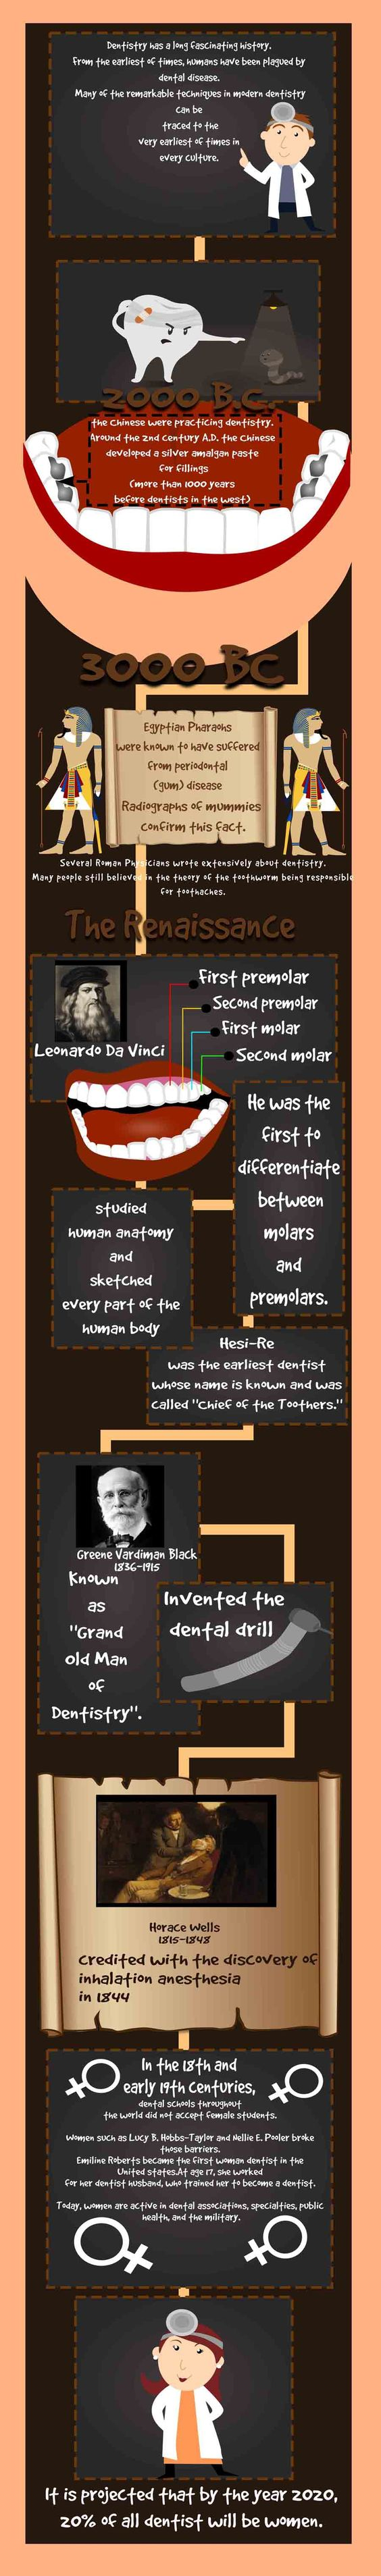 evolution of dental services u2013 a history of dentistry